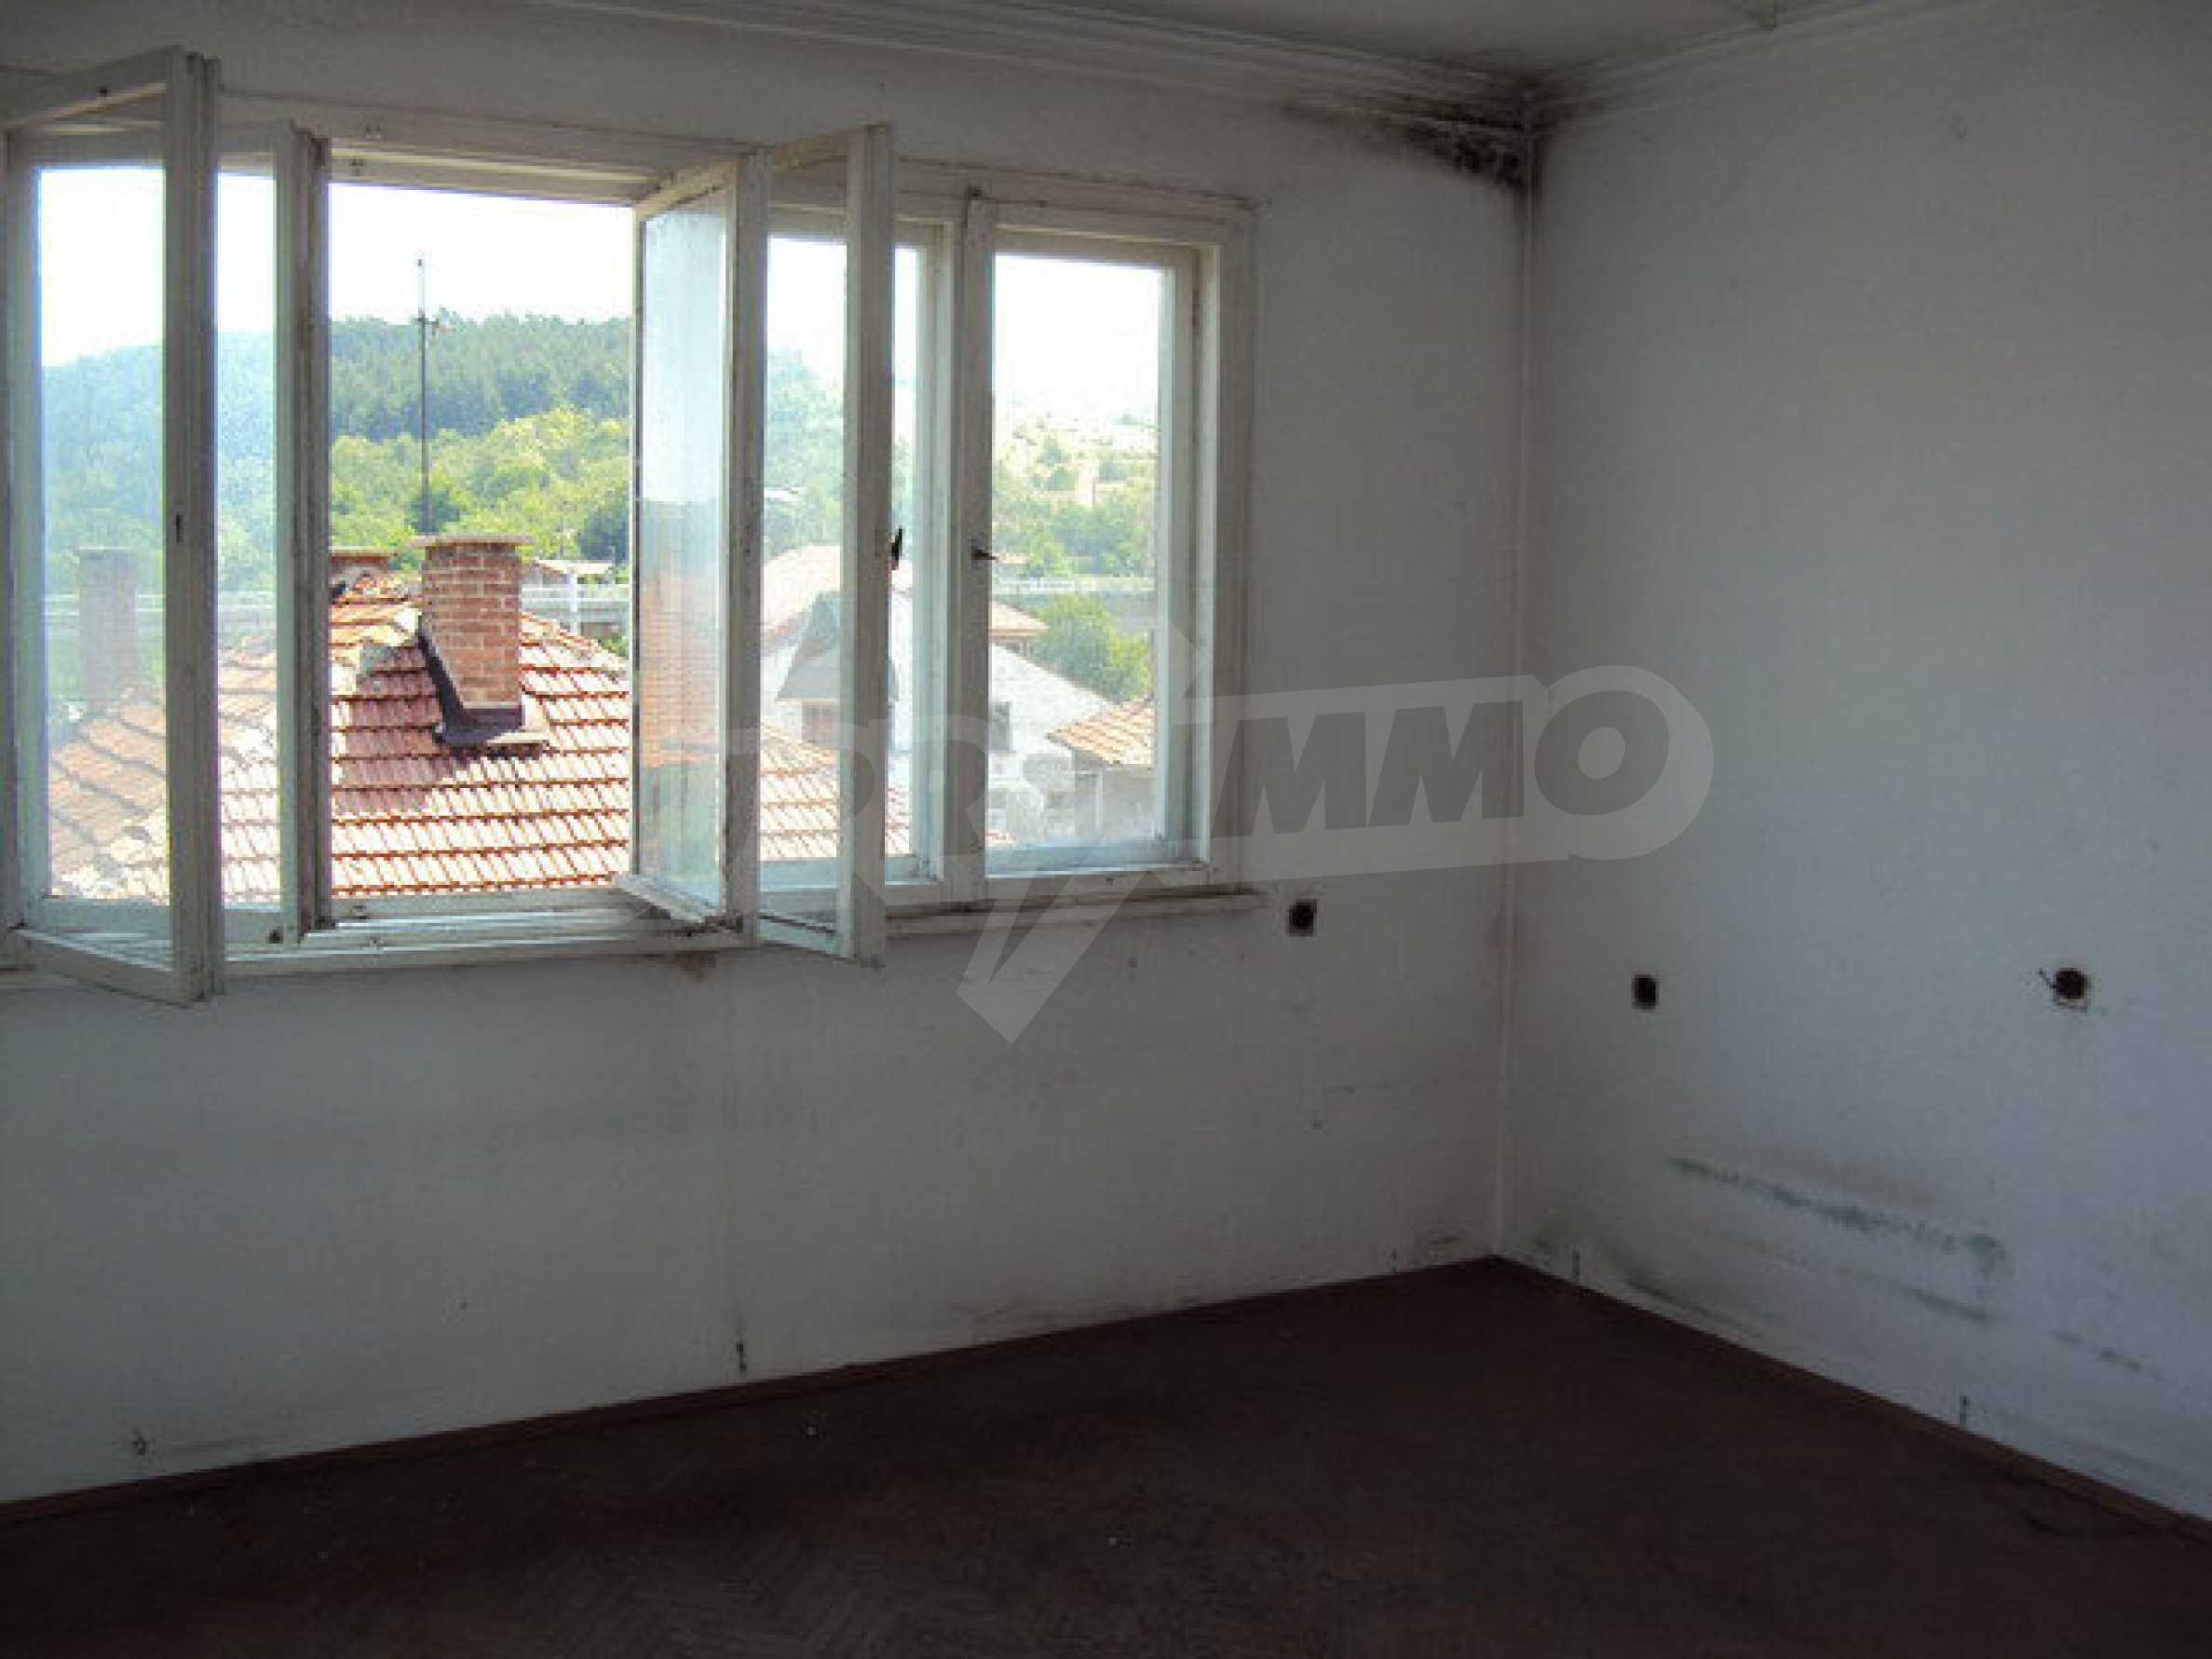 Spacious house with a yard, garage and additional building Dryanovo 21